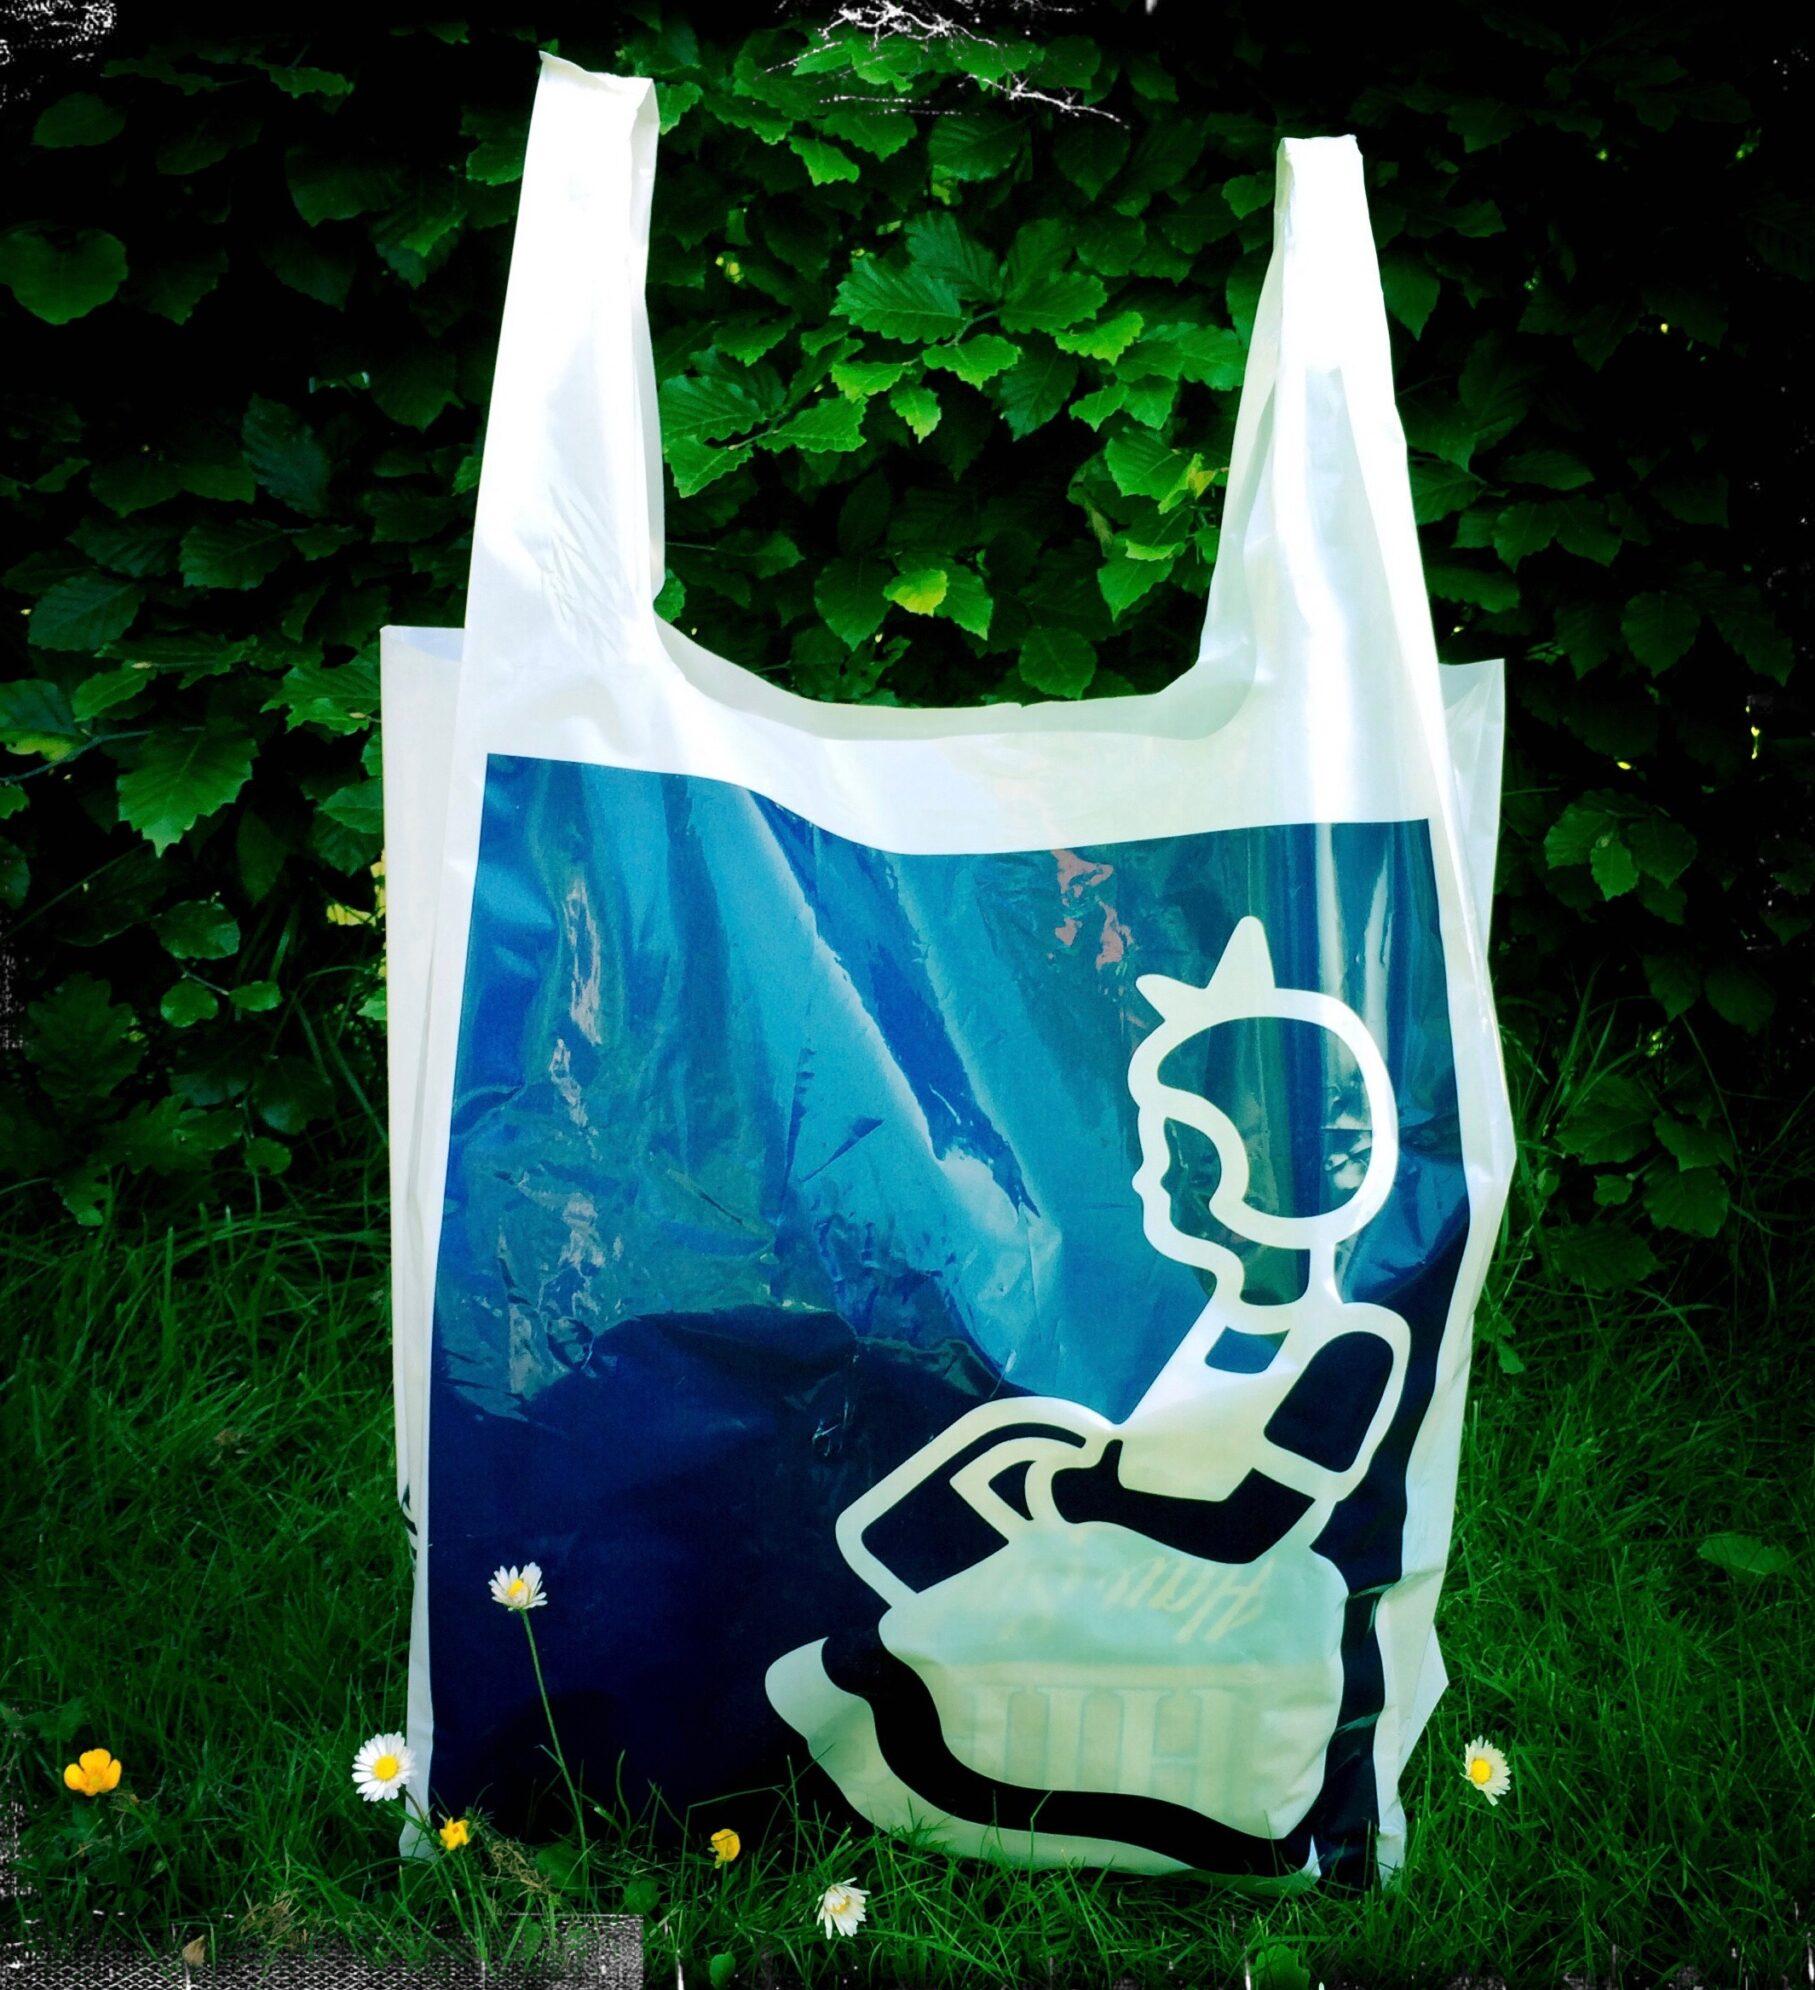 Spar på plasticposerne